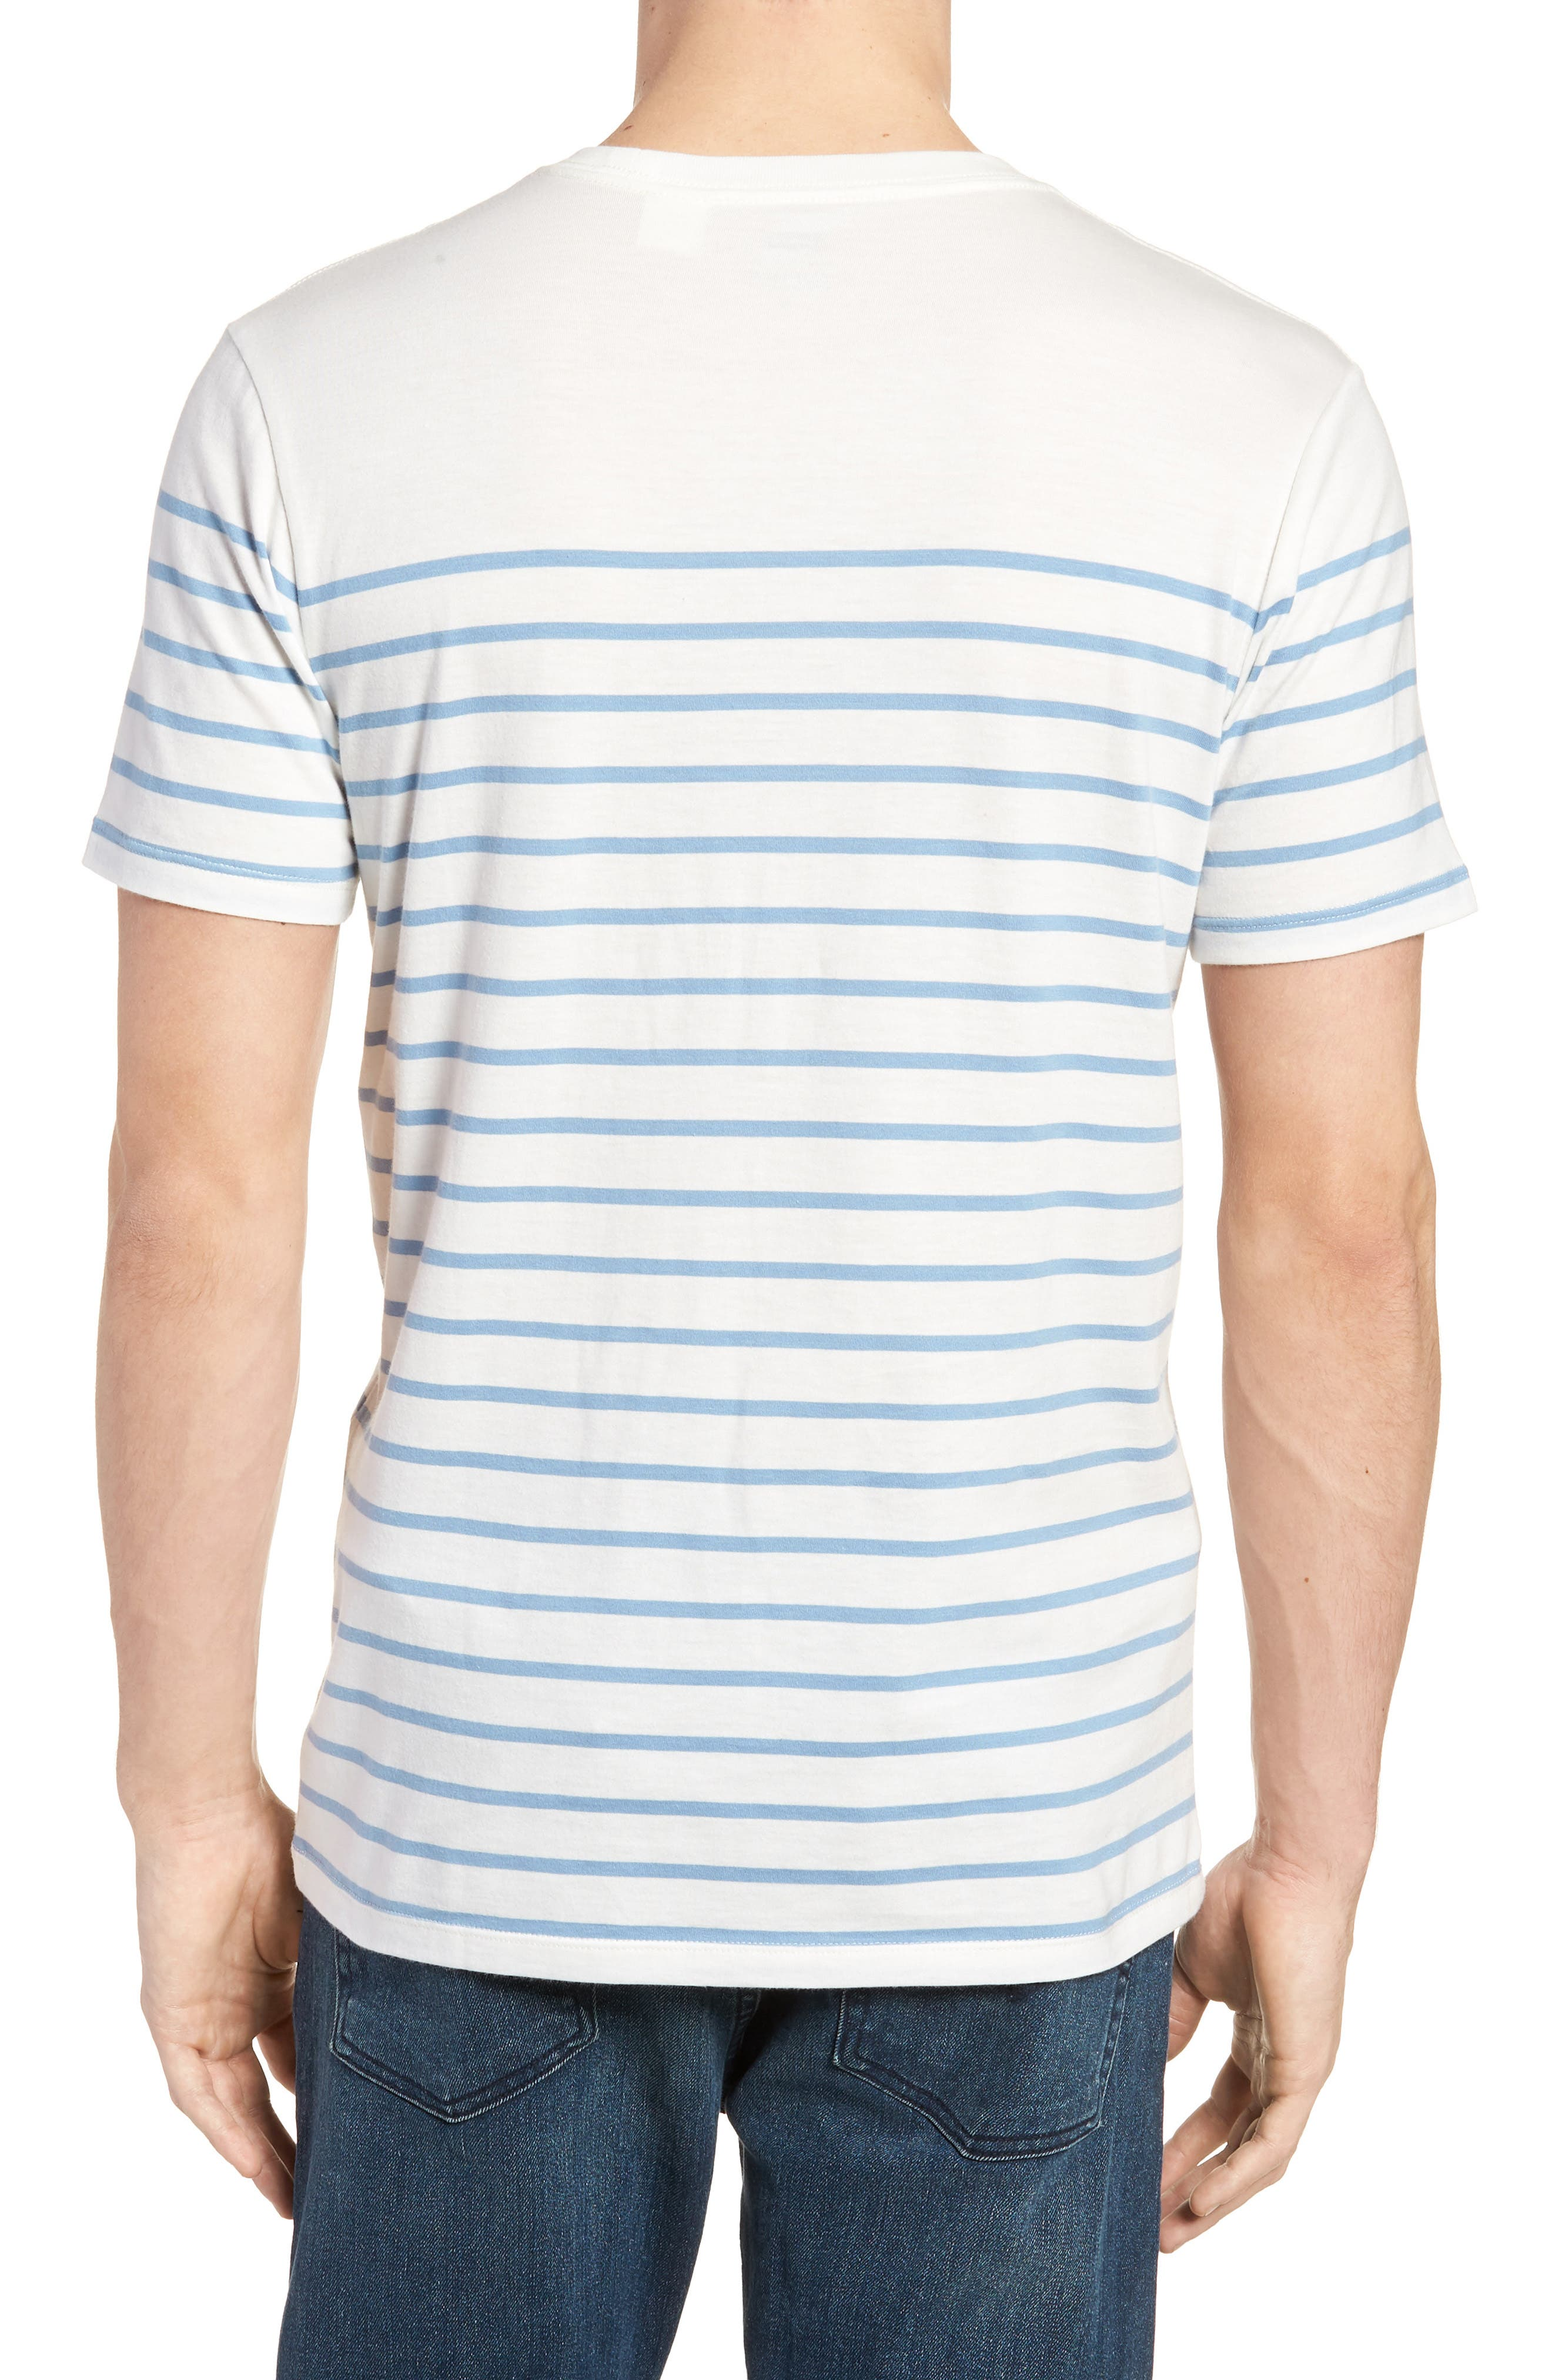 Sunset Pocket T-Shirt,                             Alternate thumbnail 2, color,                             Stripe Marshmallow / Allure